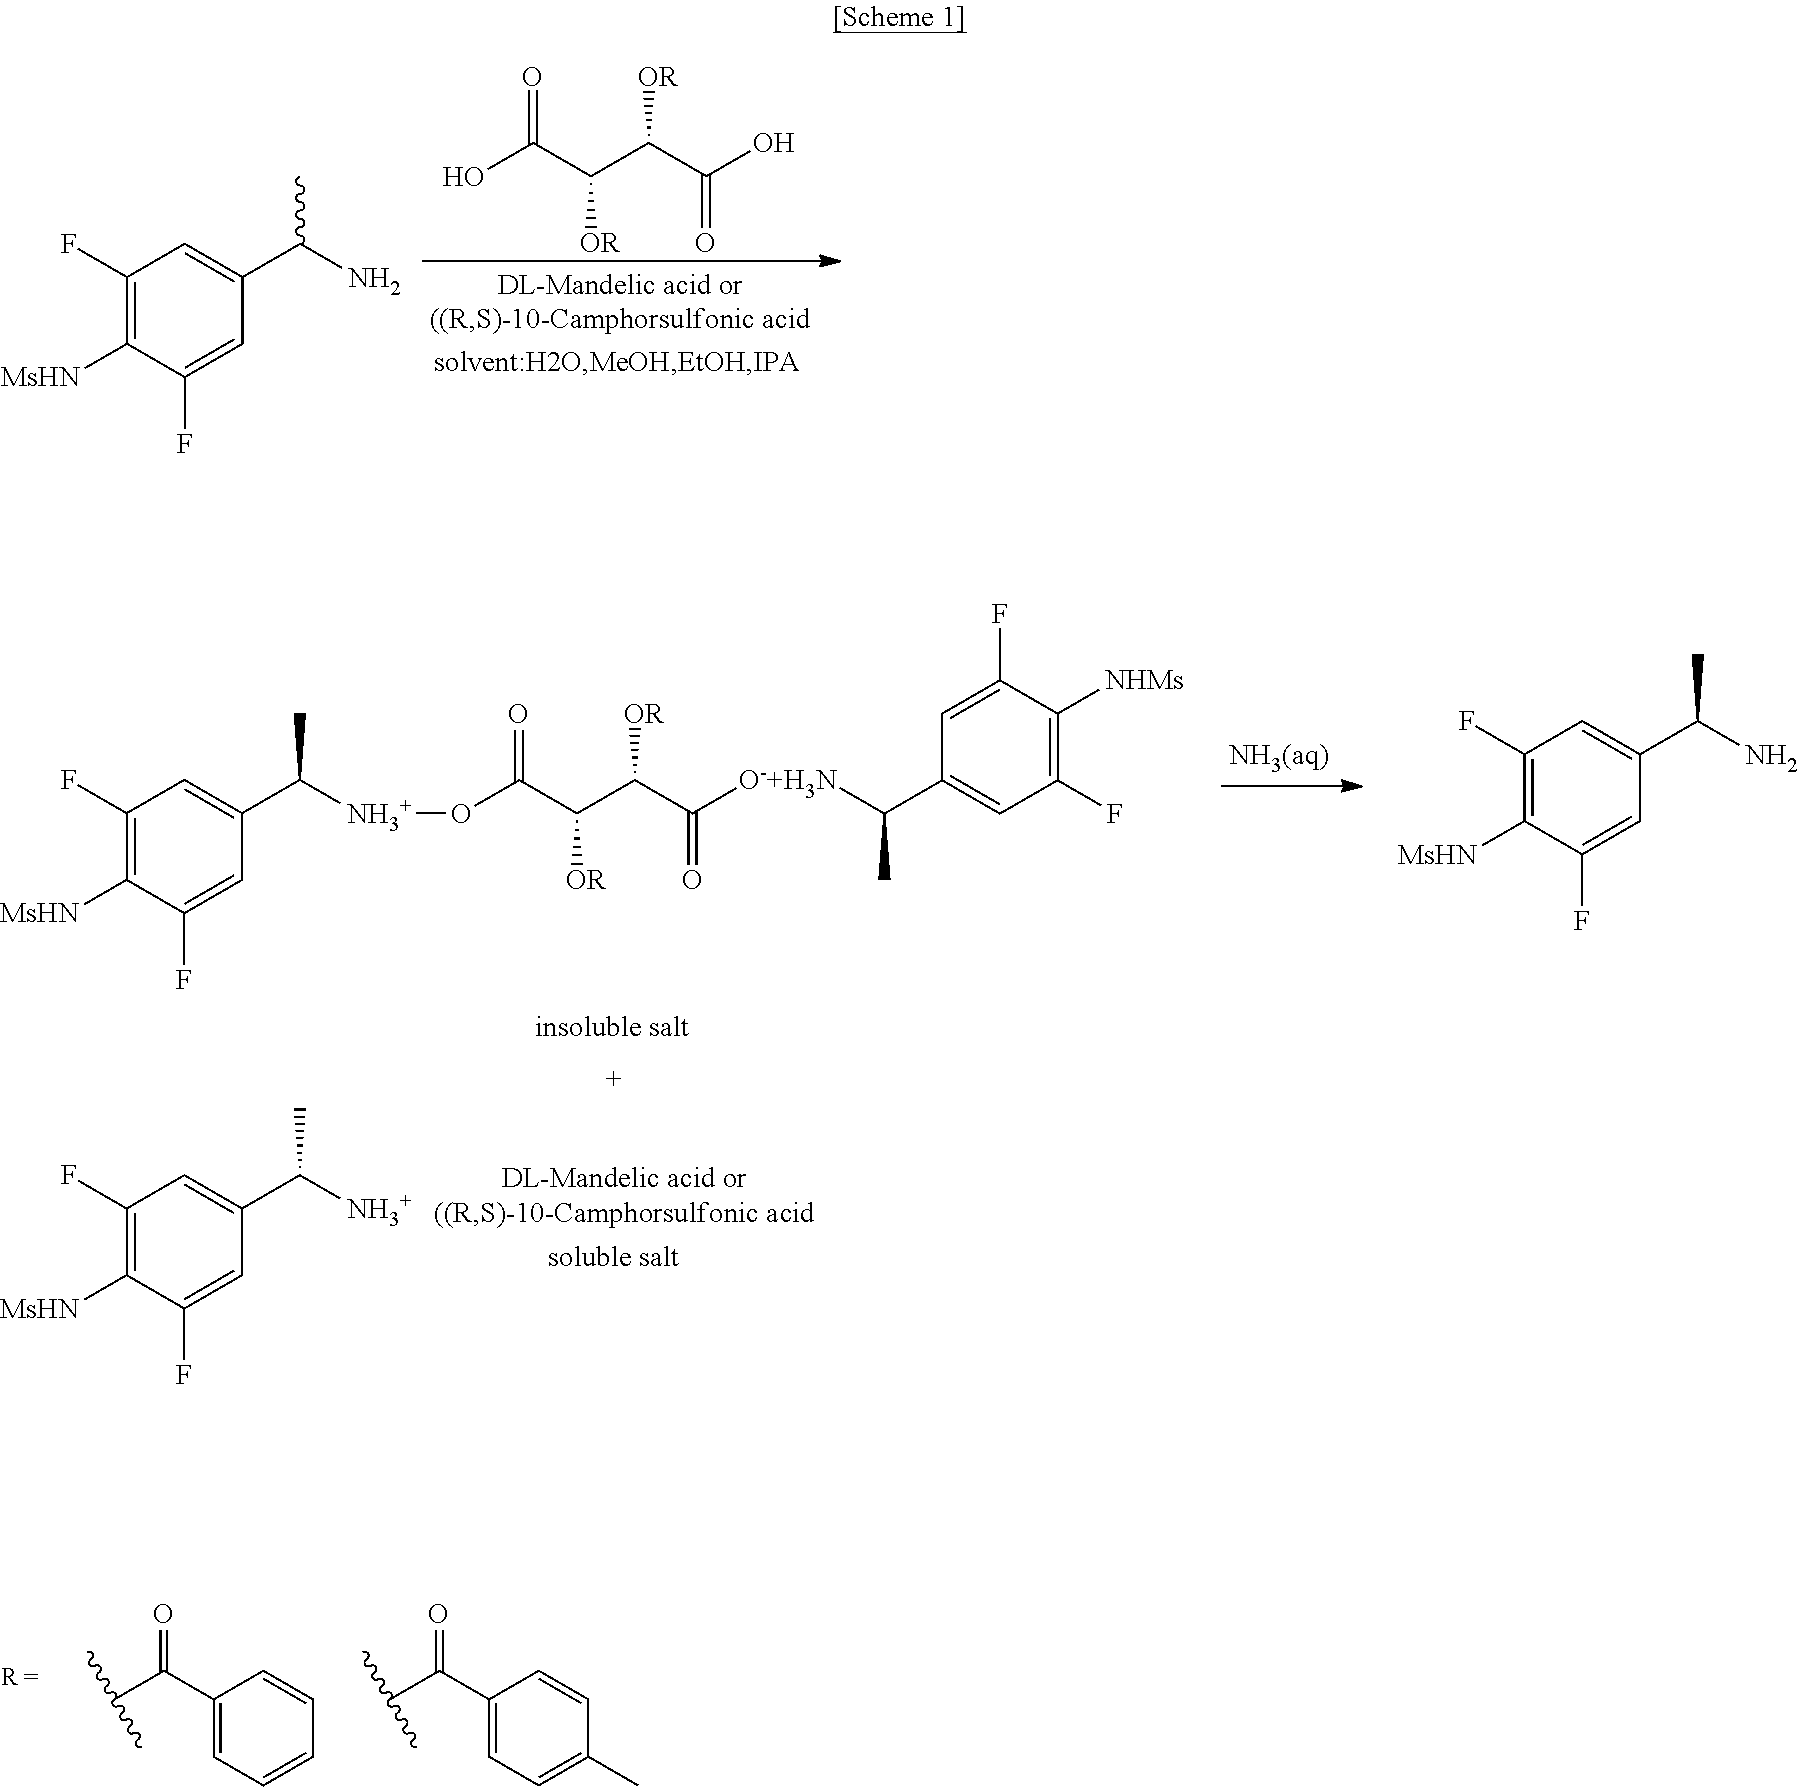 US20170342027A1 - Chiral resolution method of n-[4-(1-aminoethyl